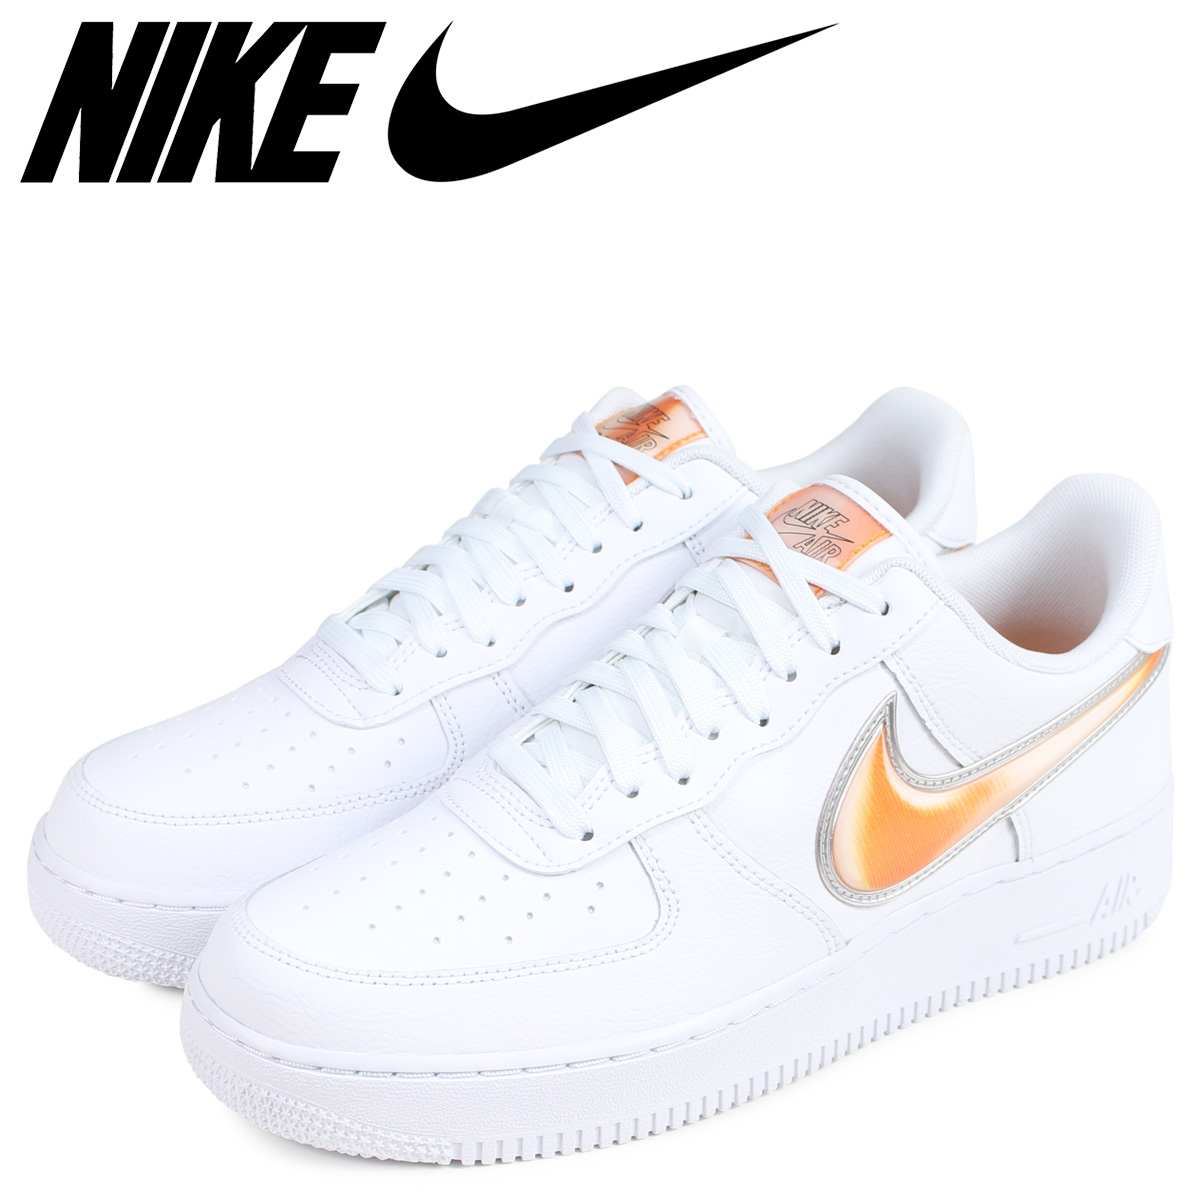 NIKE Nike air force 1 sneakers men AIR FORCE 1 07 LV8 3 white white AO2441 102